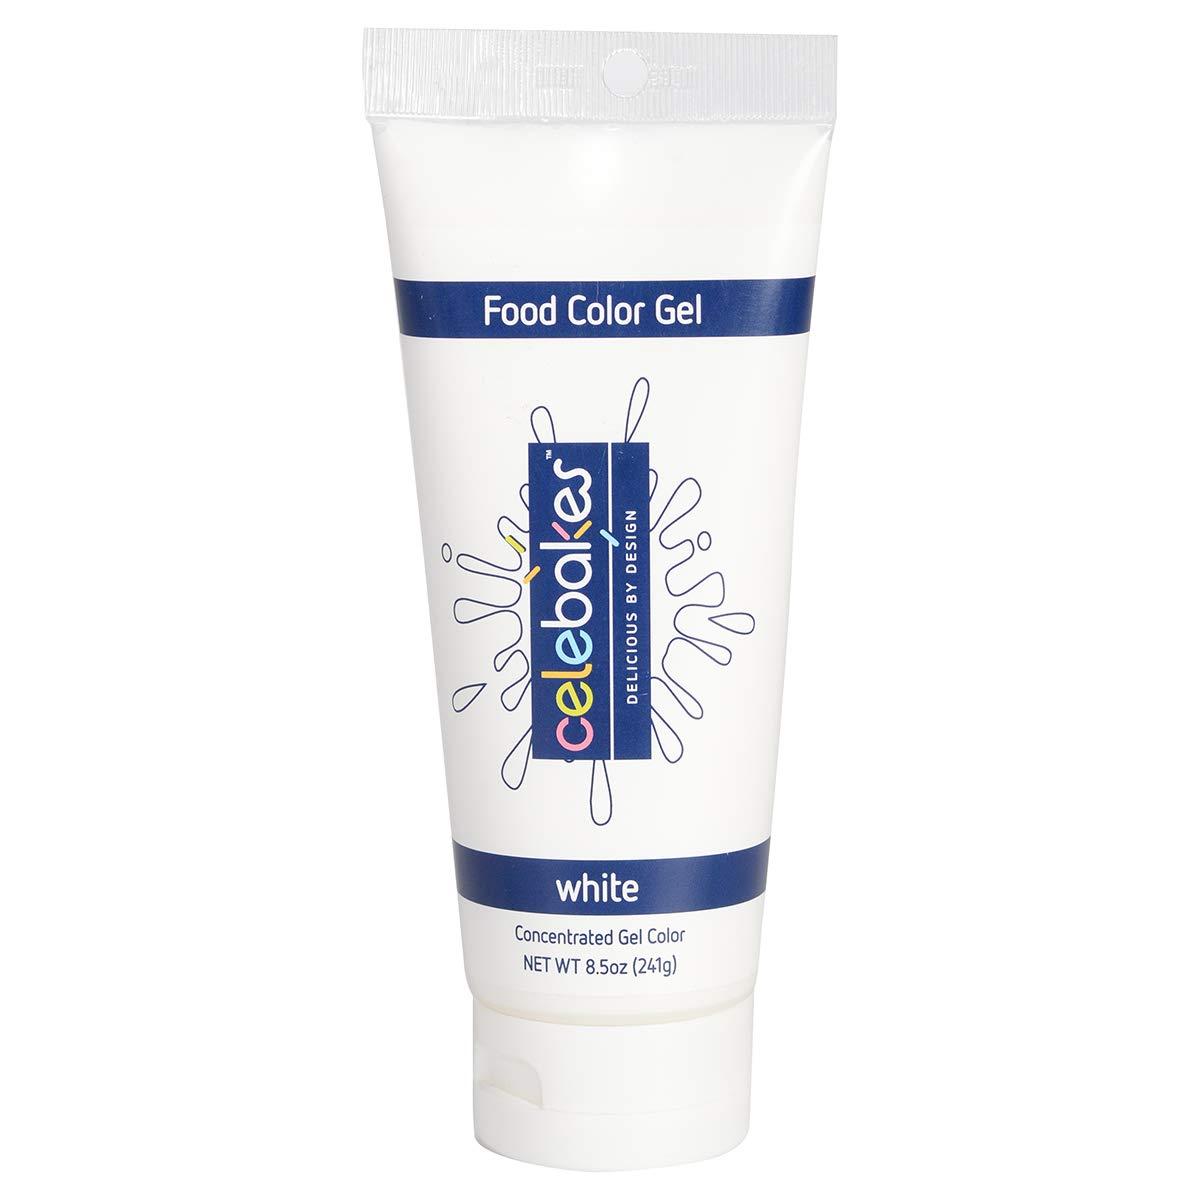 Celebakes Food Color Gel, White, 8.5oz Tube